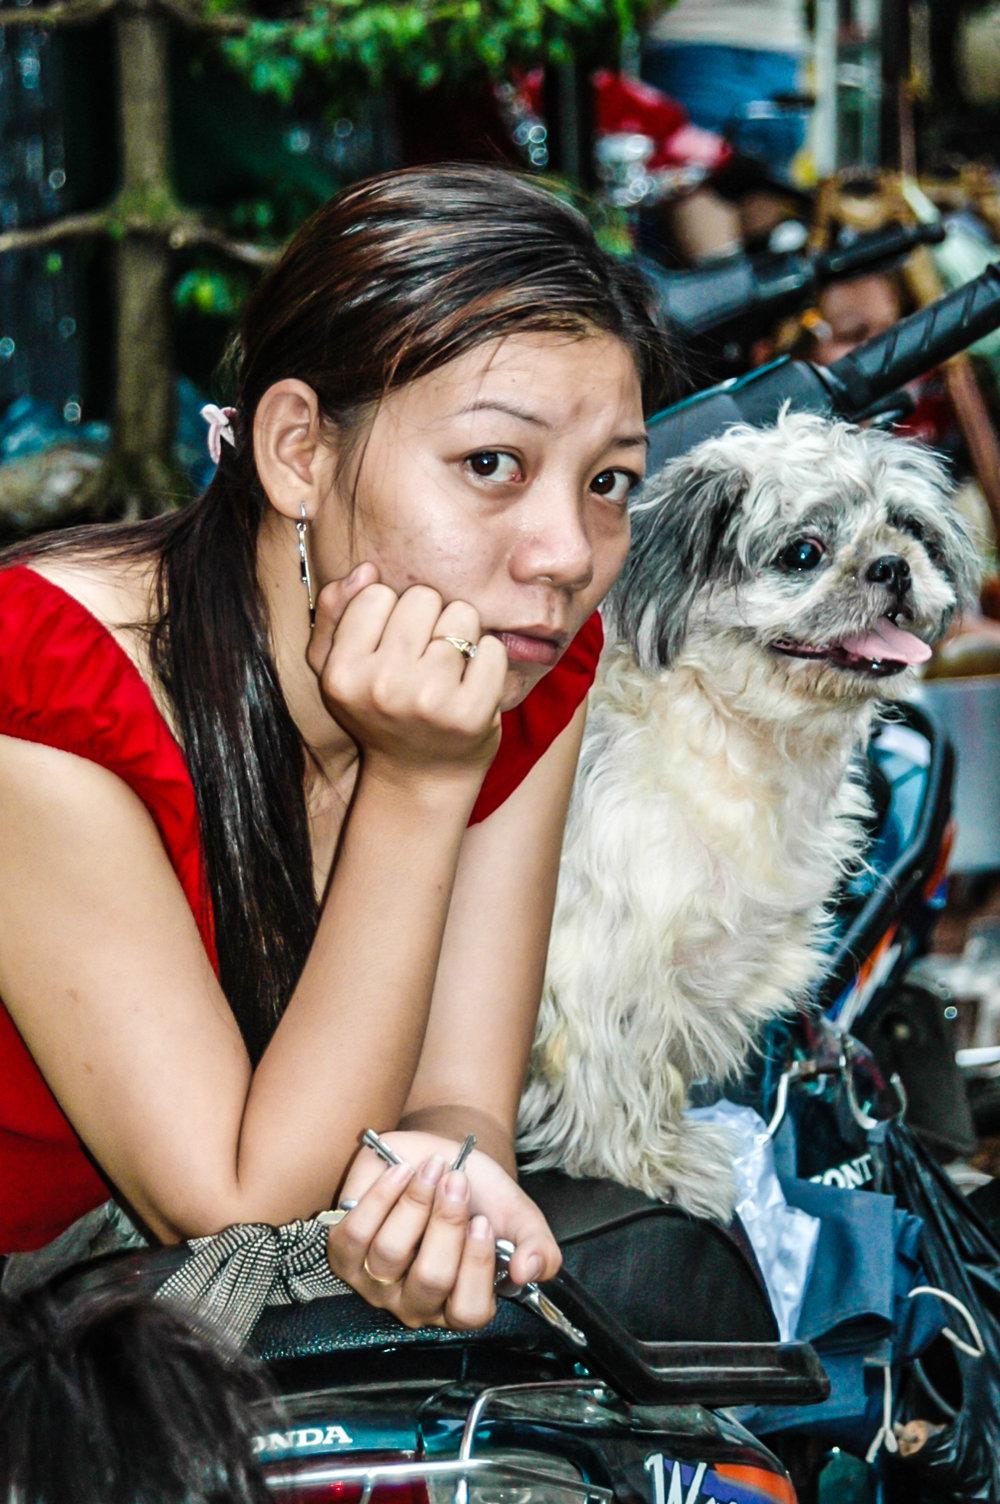 PeopleofVietnam-129.jpg